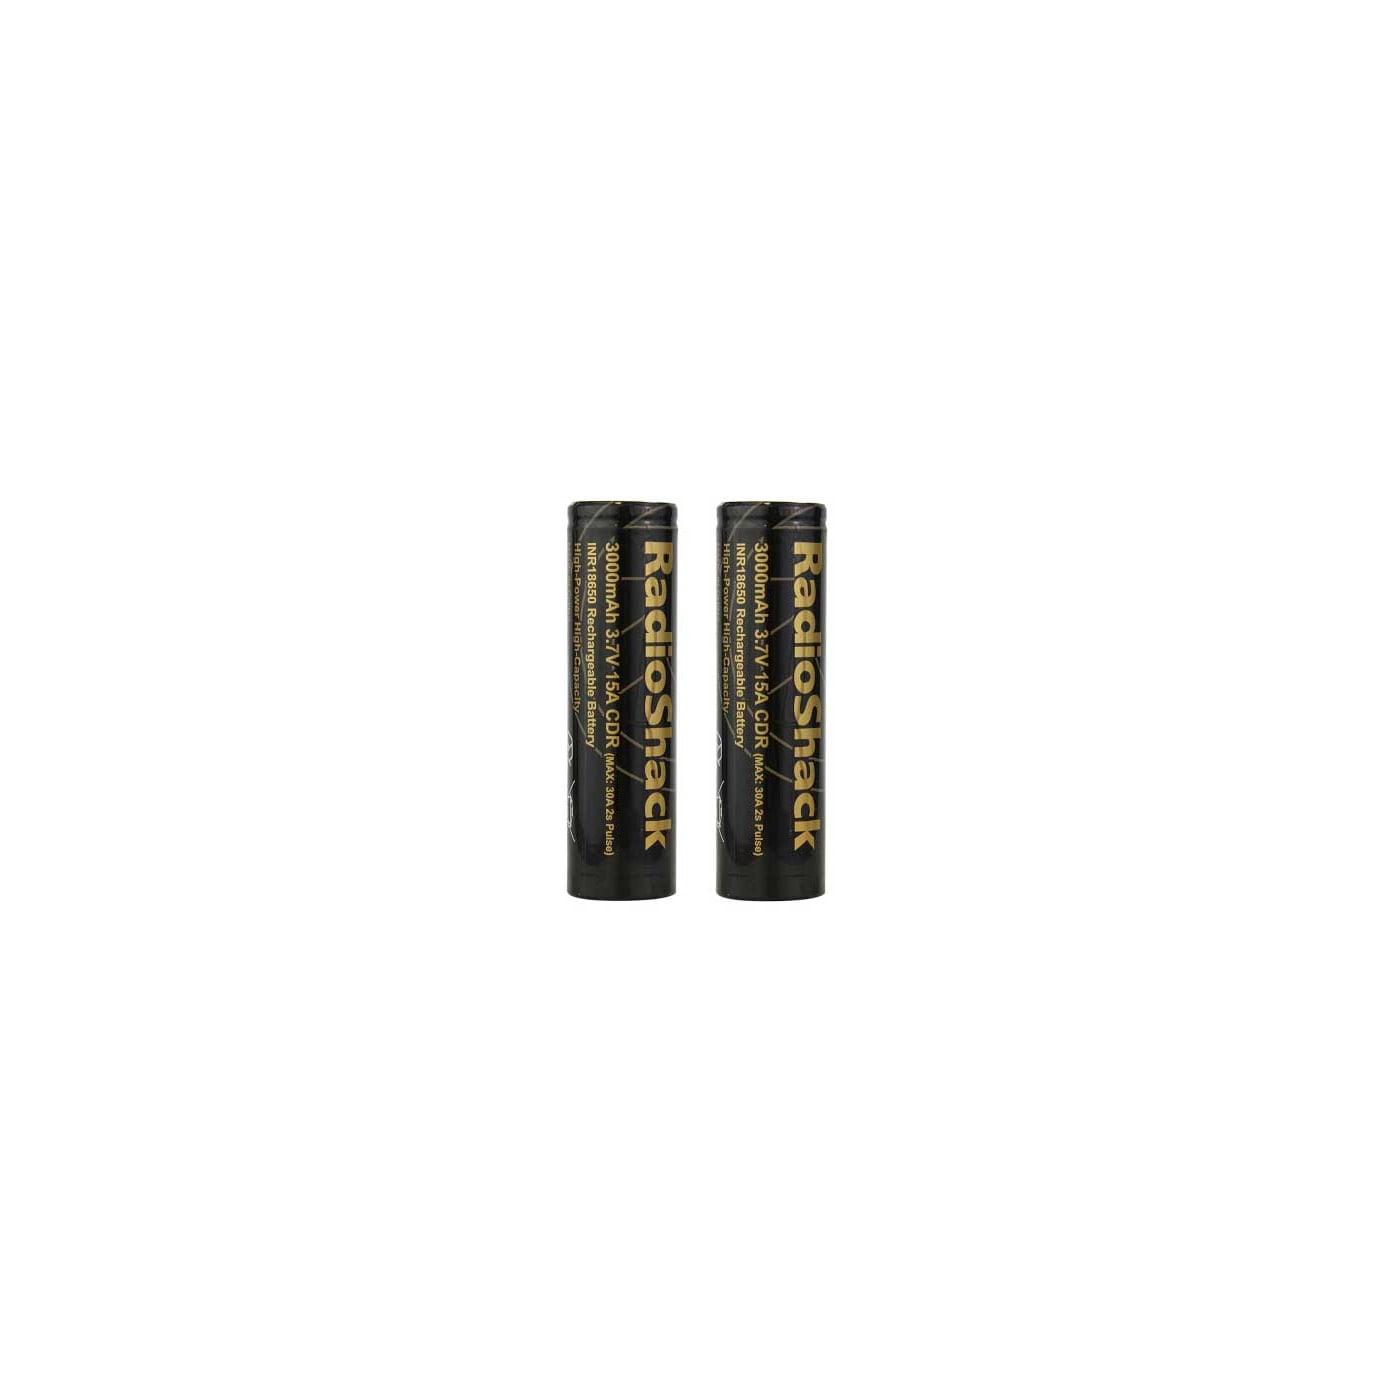 RadioShack INR 18650 15A 3000 mAh Battery 2 Pack